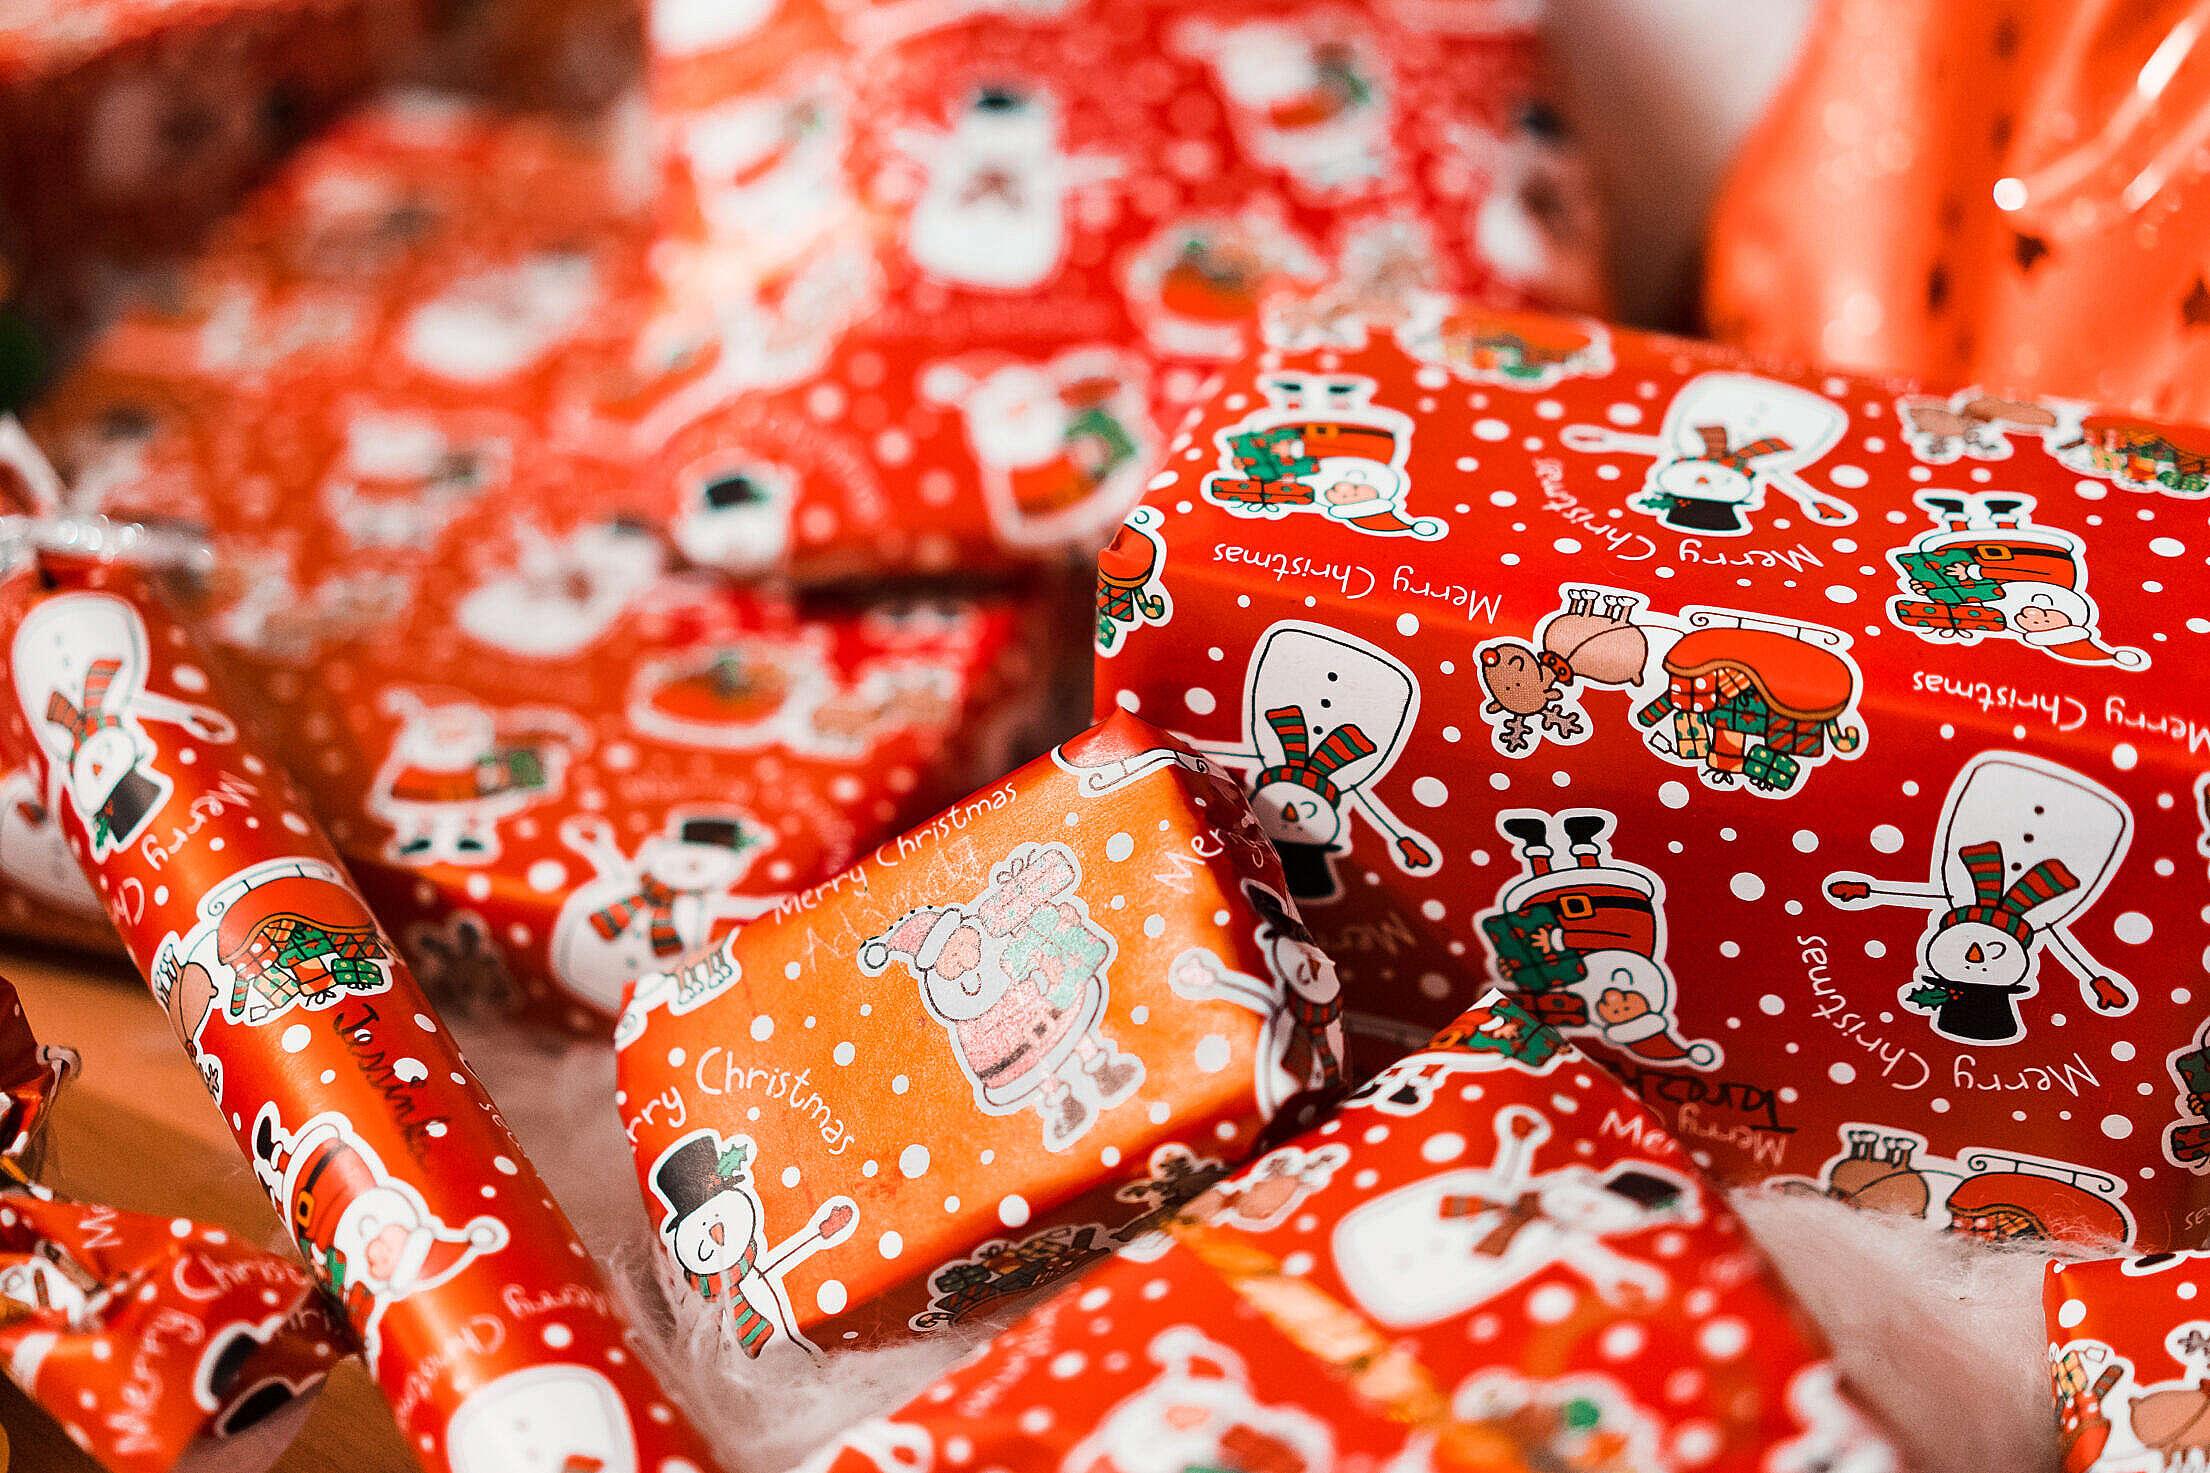 Christmas Gifts Free Stock Photo